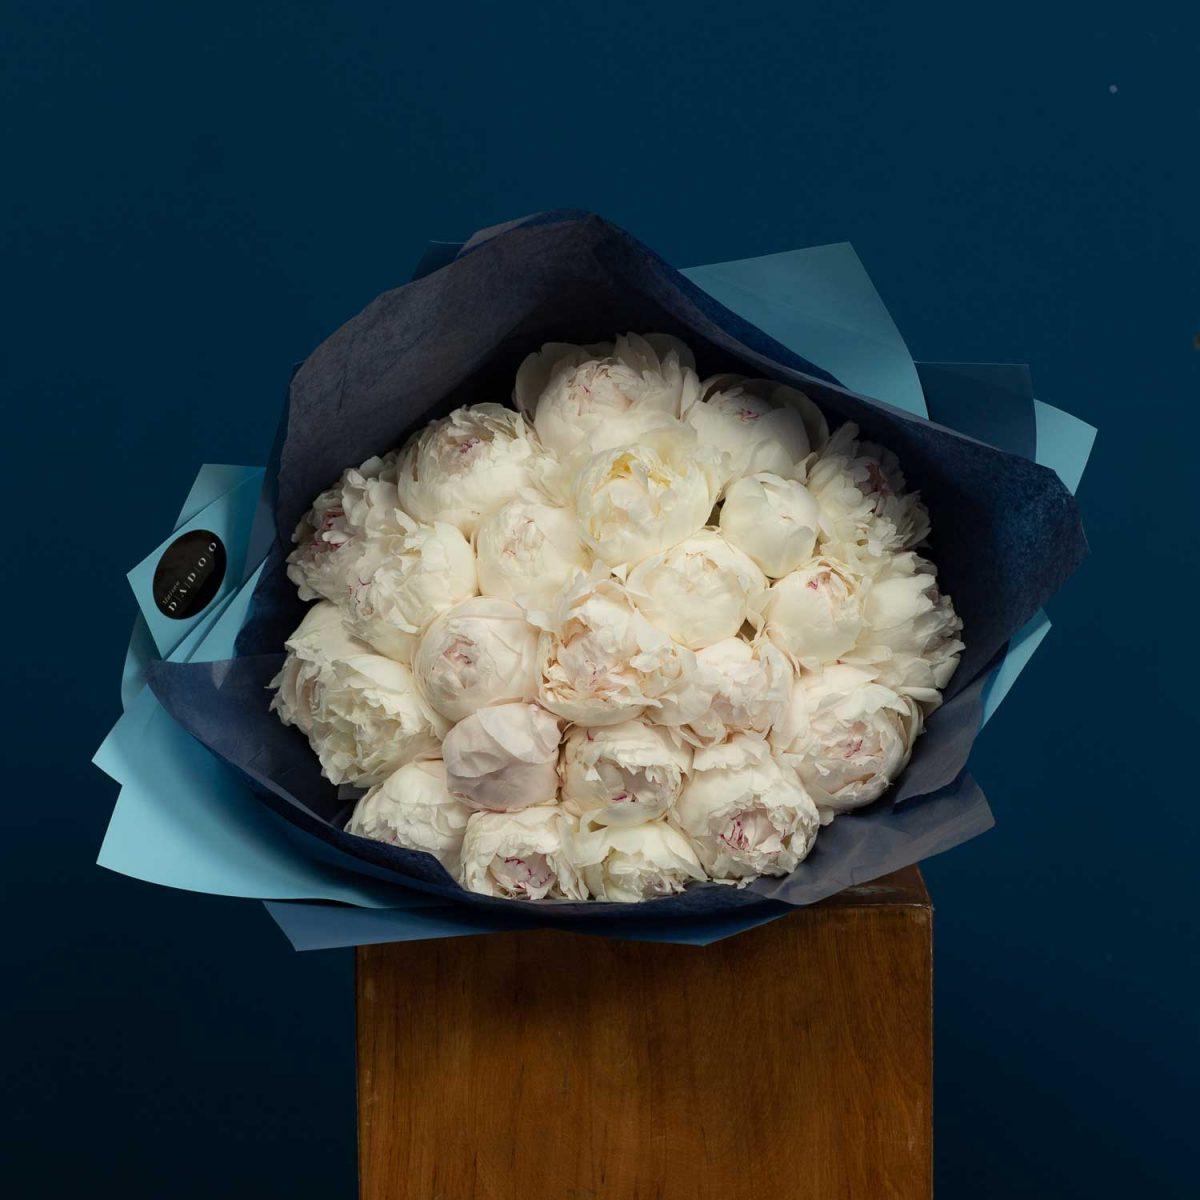 buchet-de-bujori-all-white-peonies-maison-dadoo-1500×1500-2-1200×1200